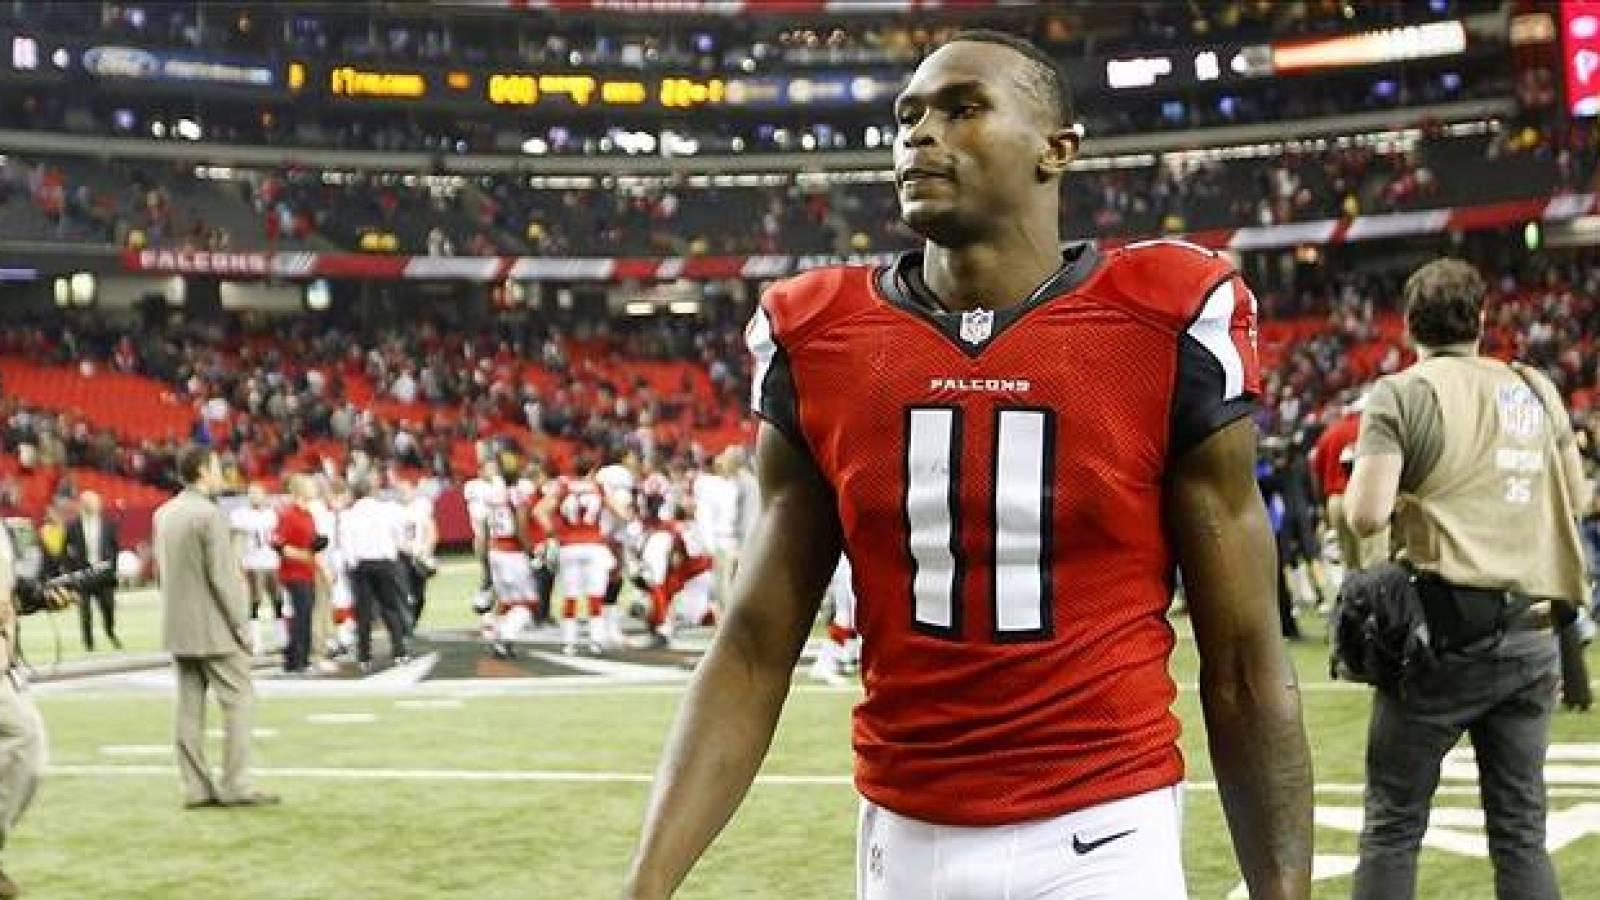 Falcons Injury Report: WR Julio Jones, S William Moore End